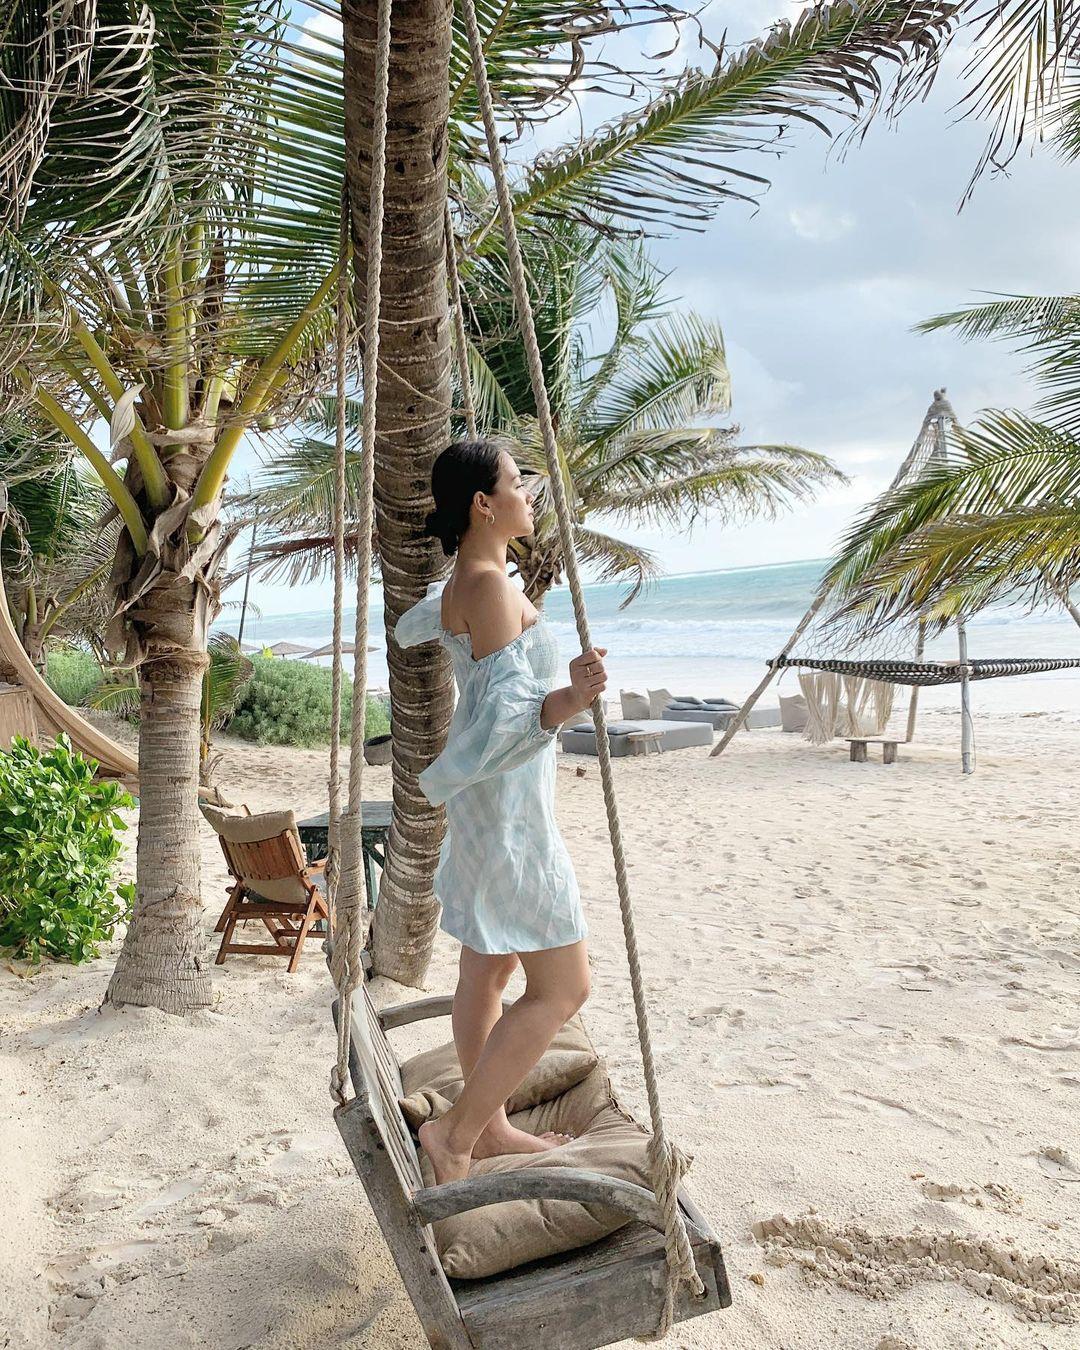 maja salvador beach outfits